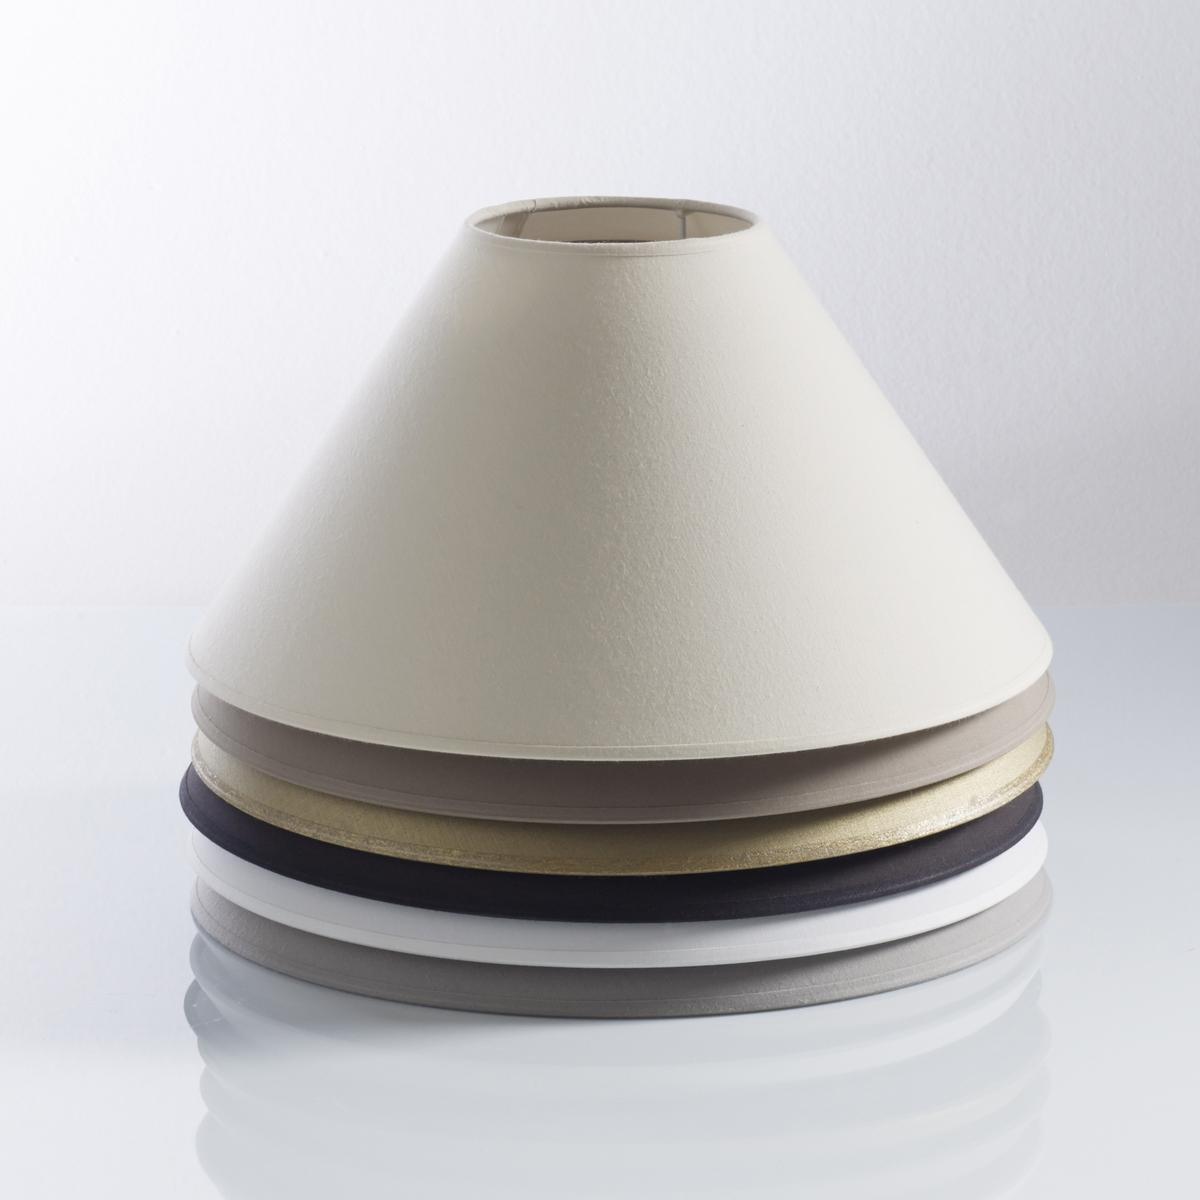 Абажур конусообразный светильники pabobo абажур